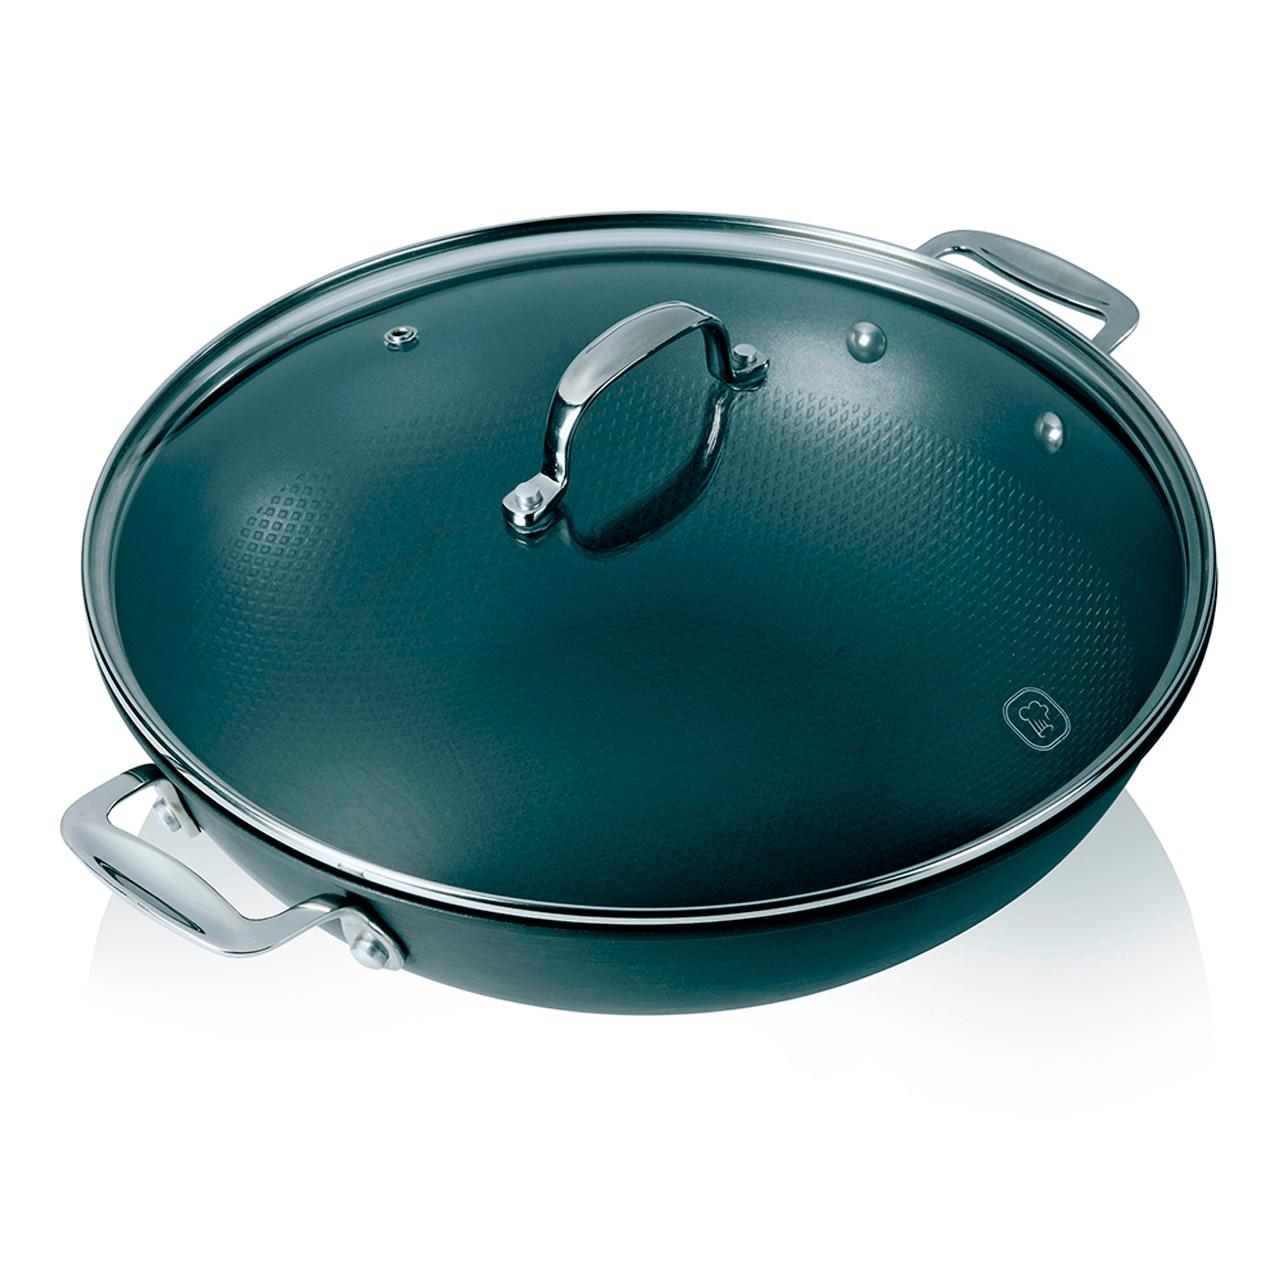 Wok with lid Rondell Wok 4,6 L RDA-114 wok box